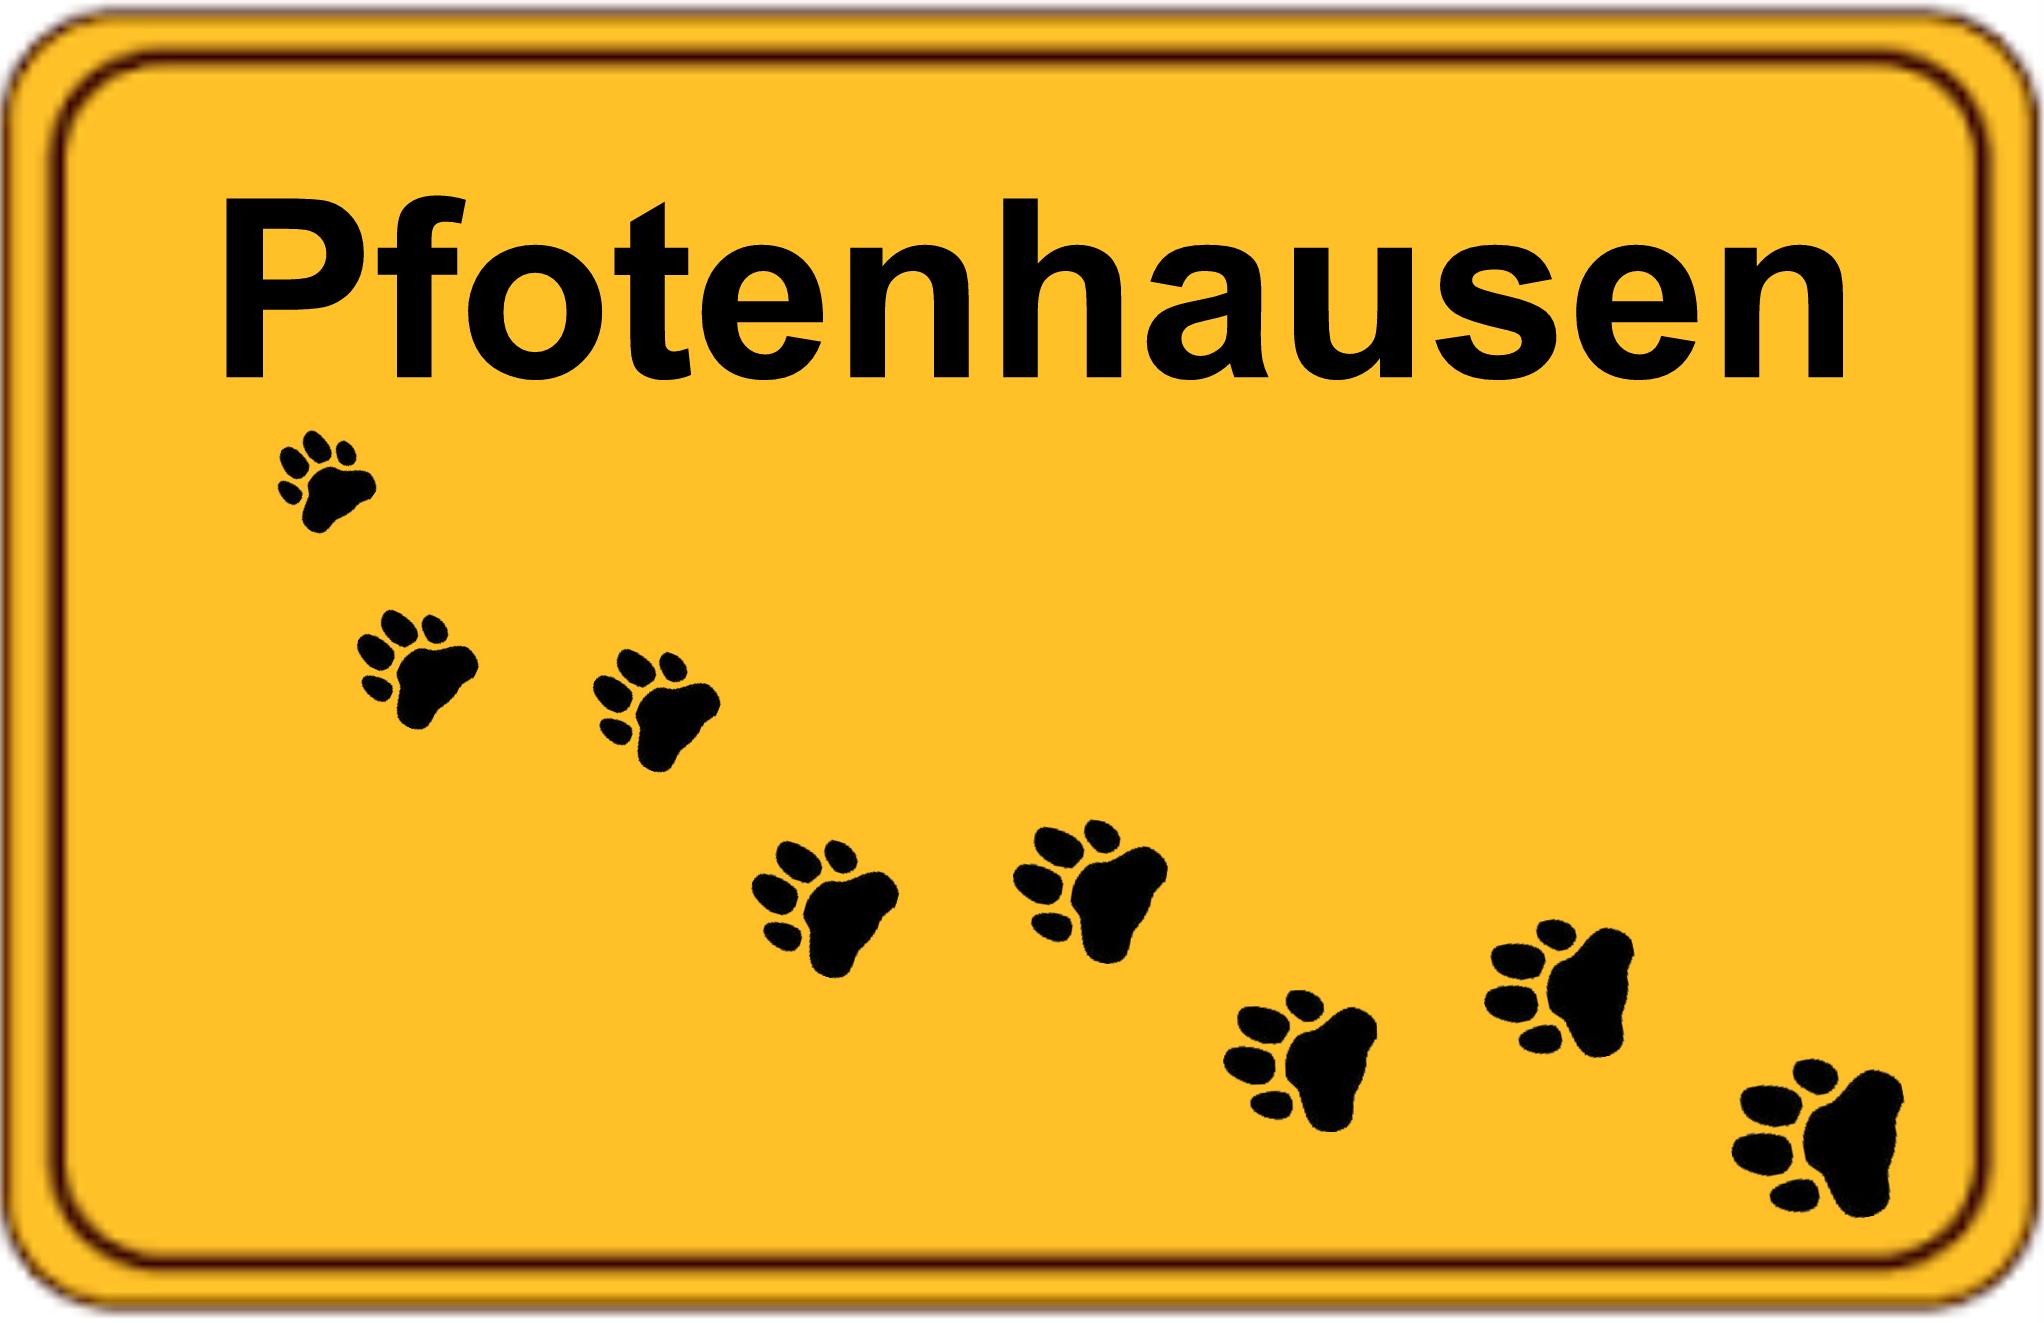 Pfotenhausen